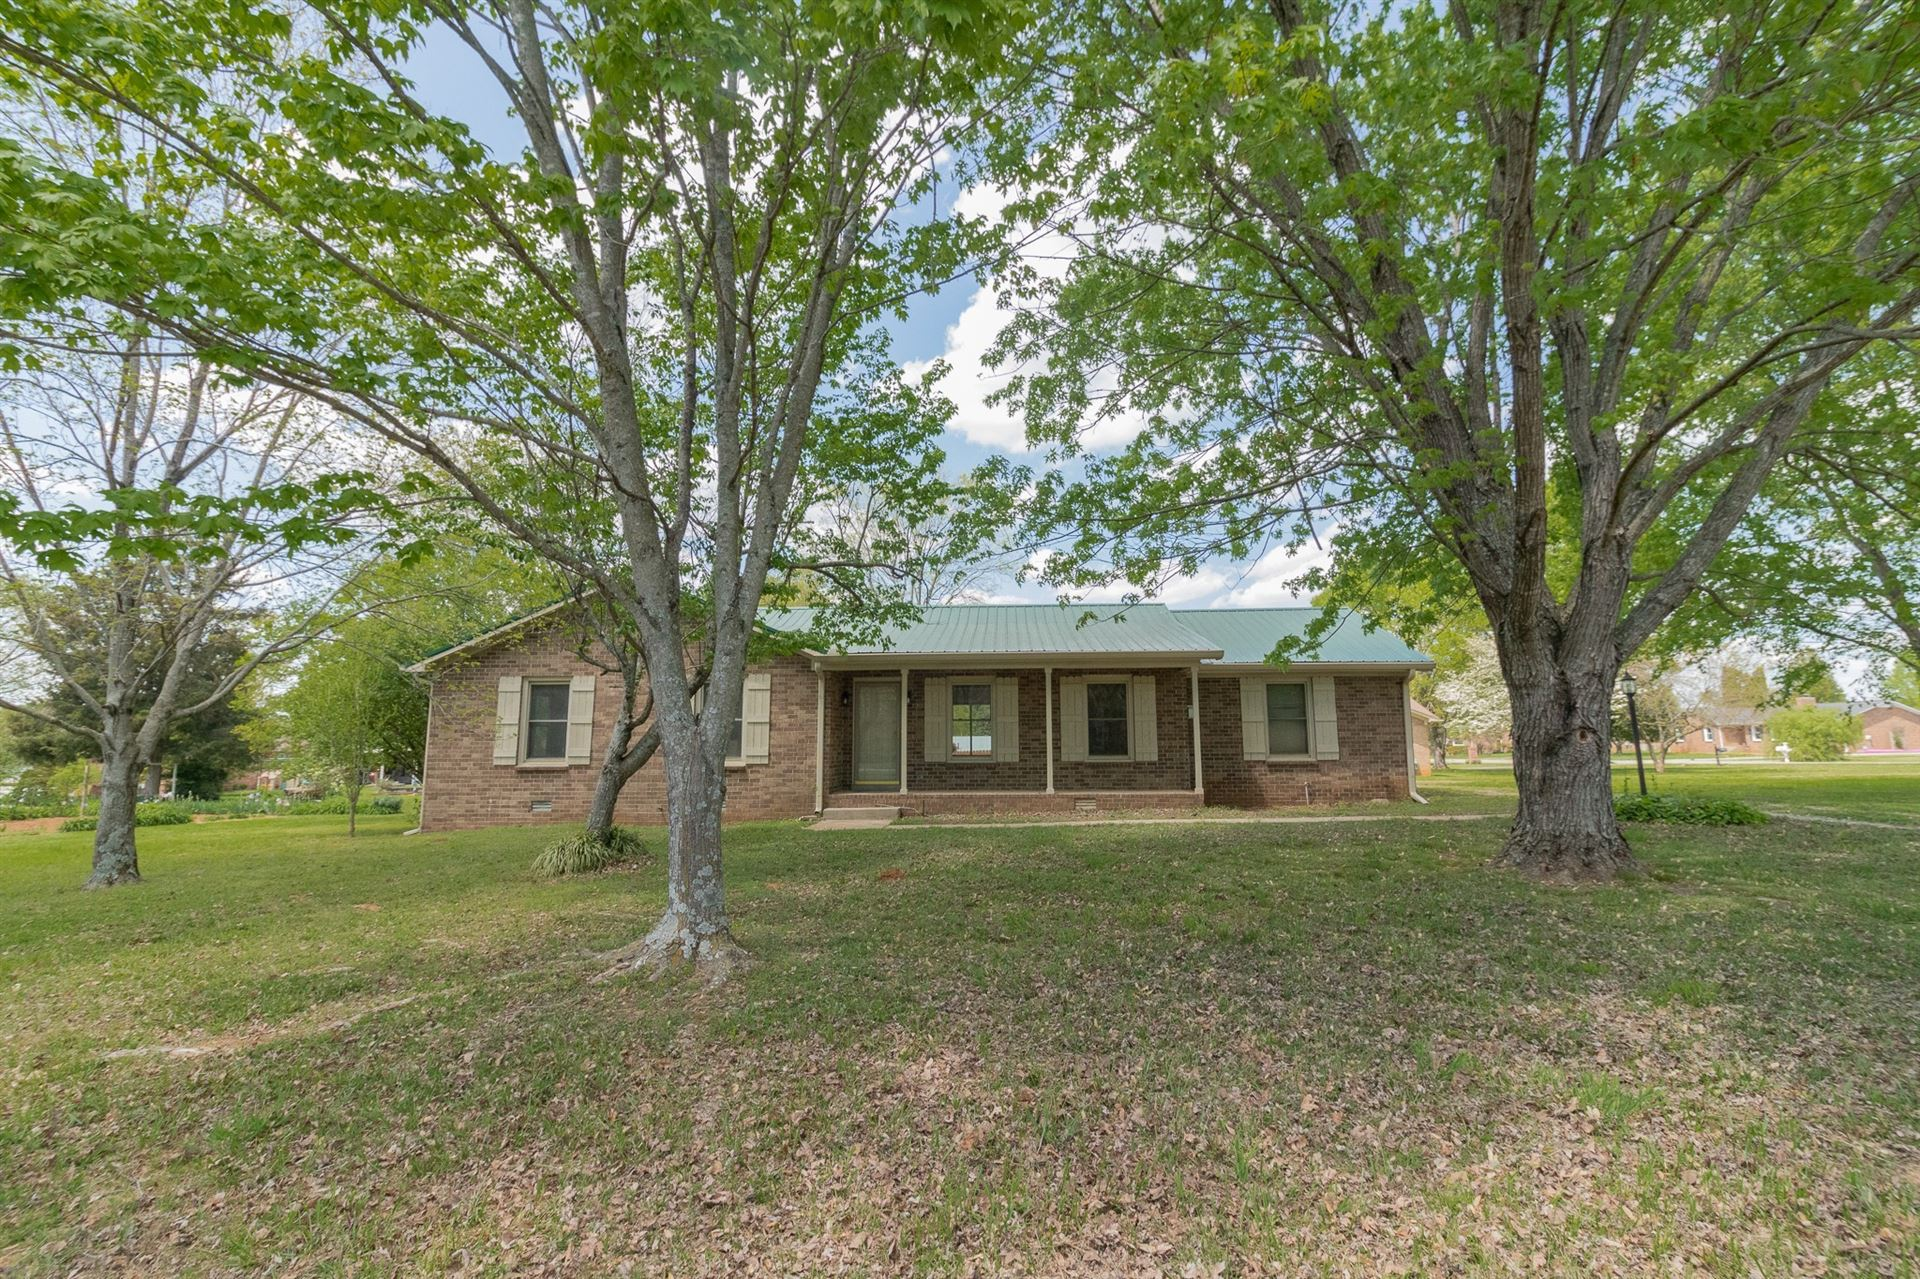 2988 Cotton Mill Dr, Murfreesboro, TN 37129 - MLS#: 2253017